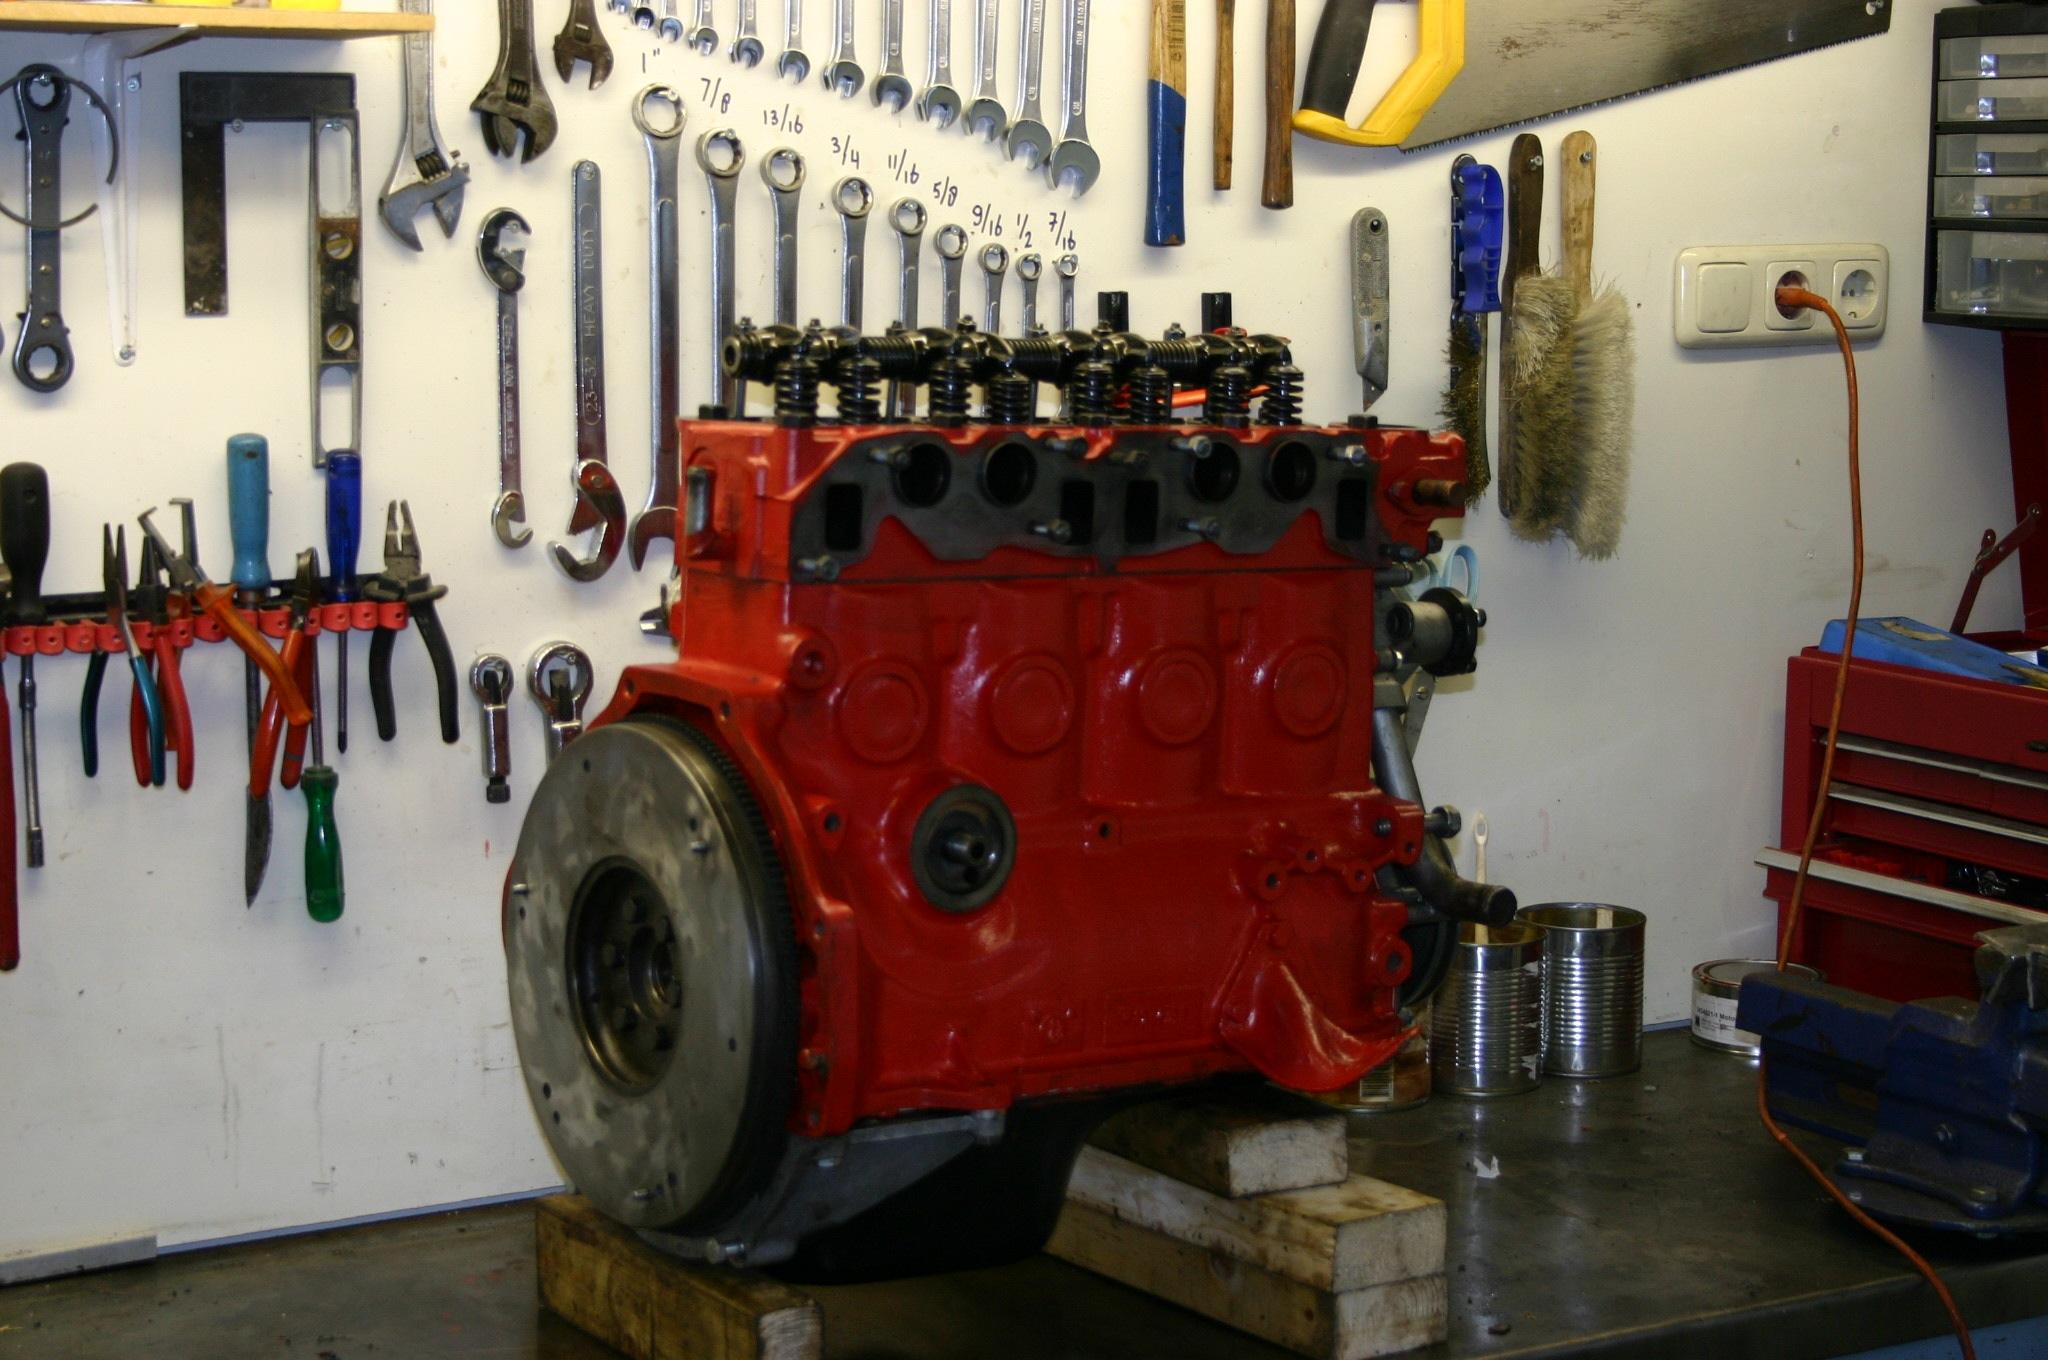 overhauled volvo b20 engine rear.jpg